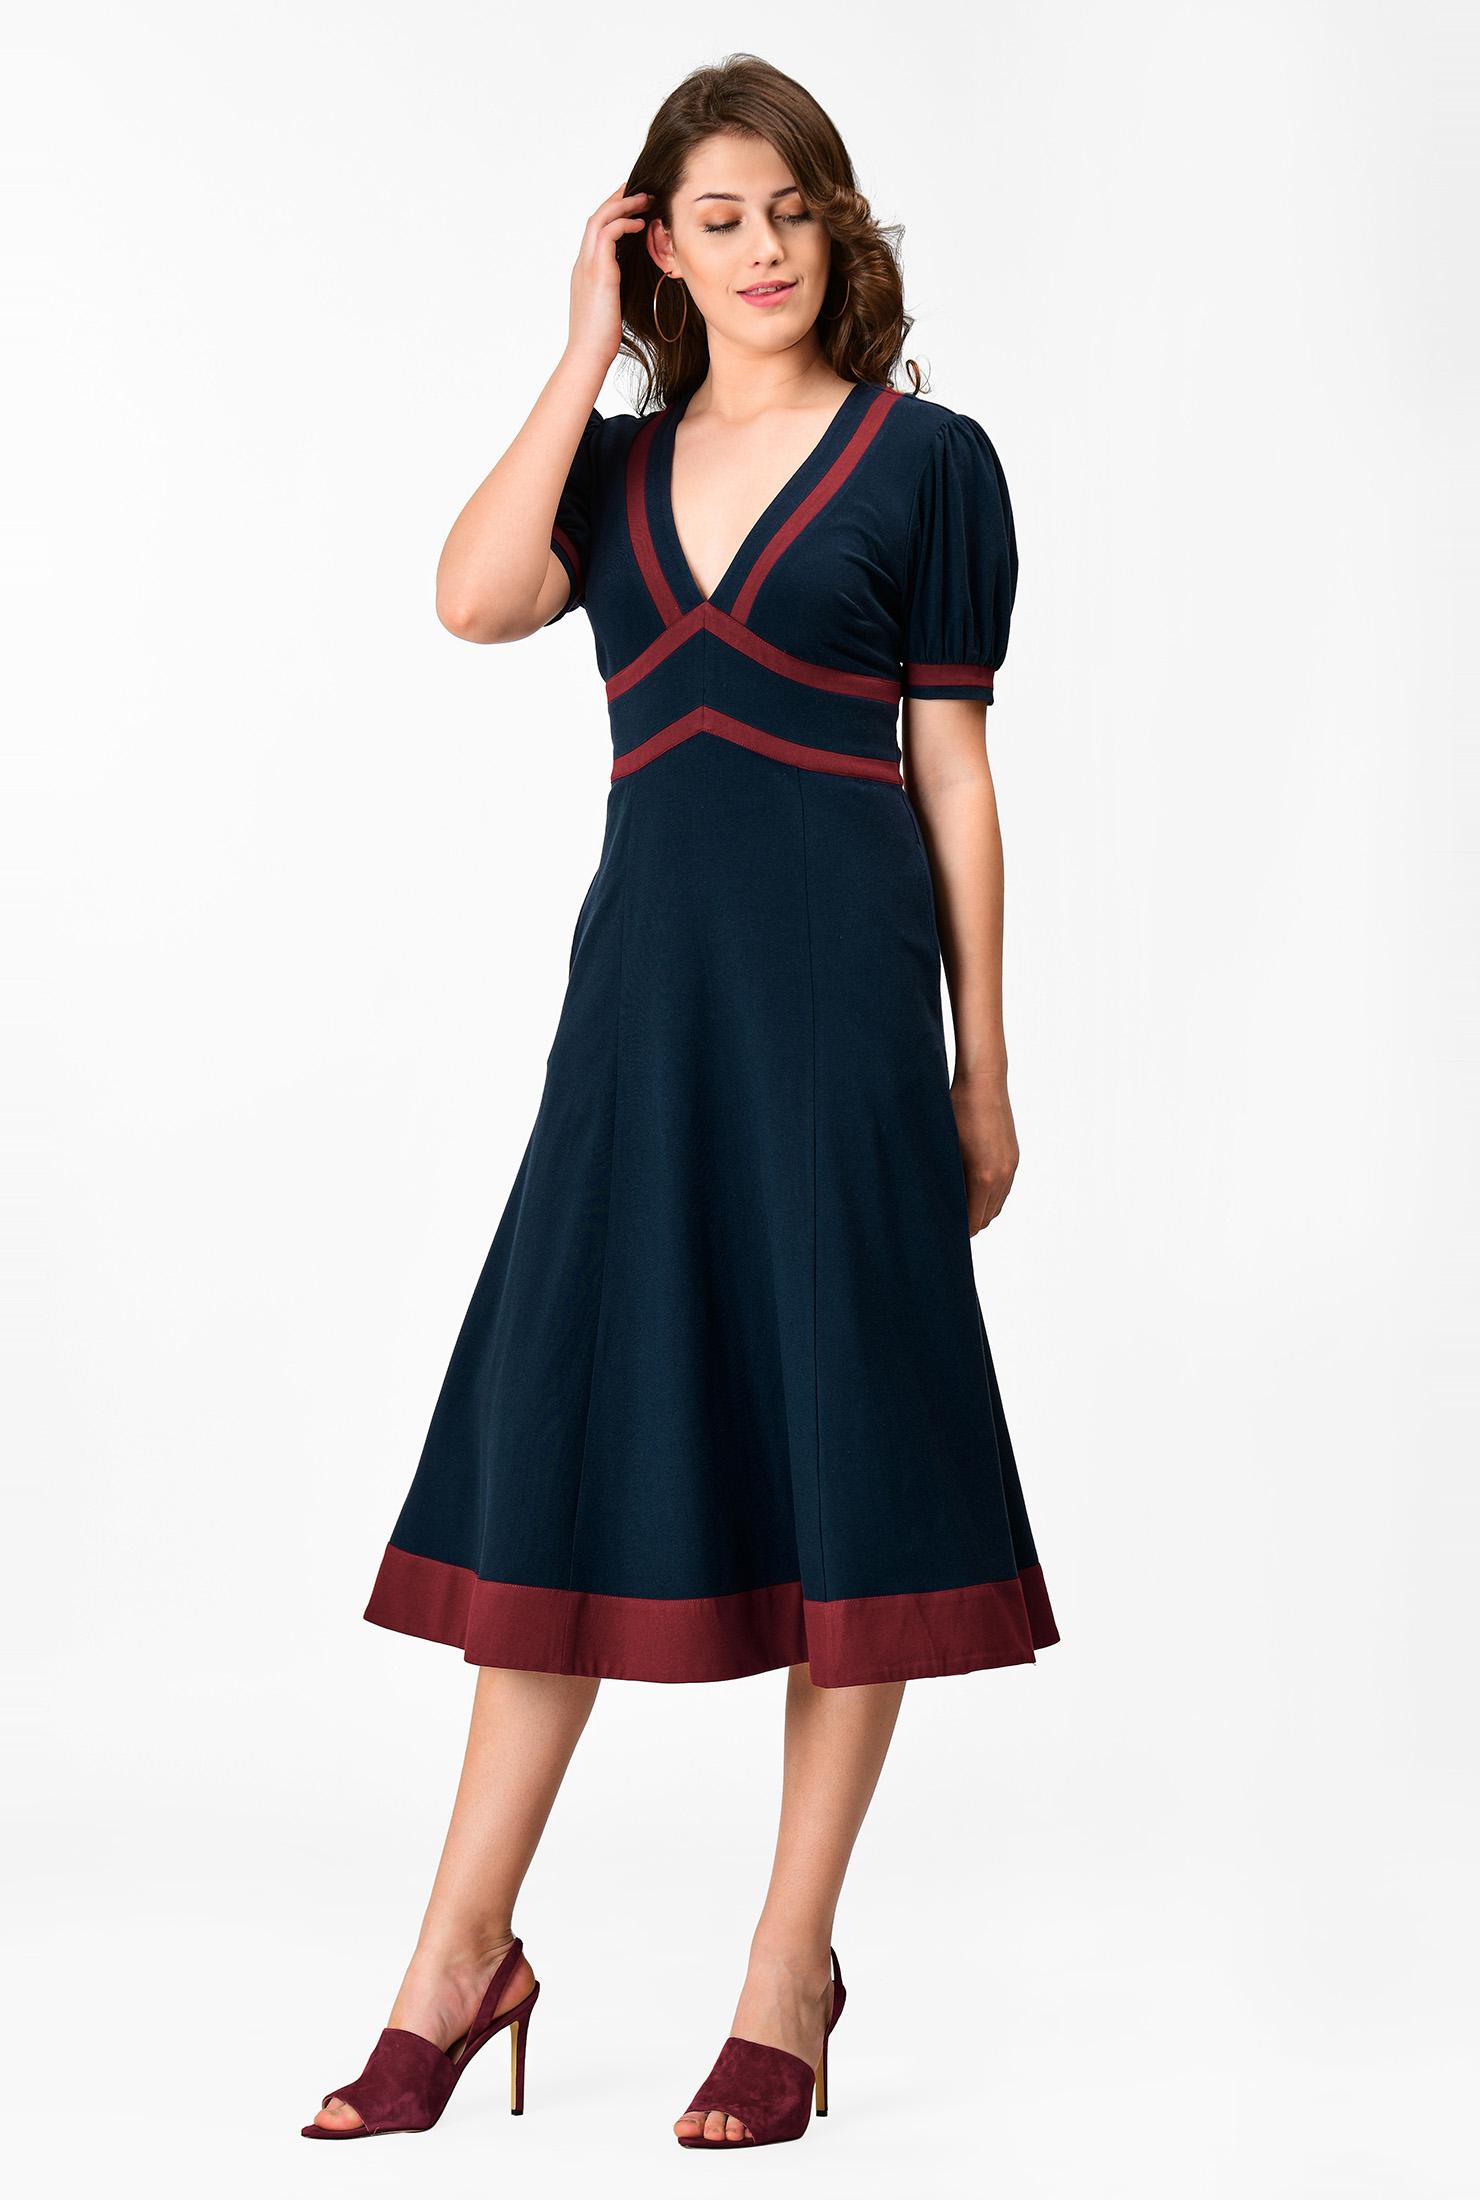 1930s Day Dresses, Tea Dresses, House Dresses Cotton knit contrast trim empire dress $64.95 AT vintagedancer.com